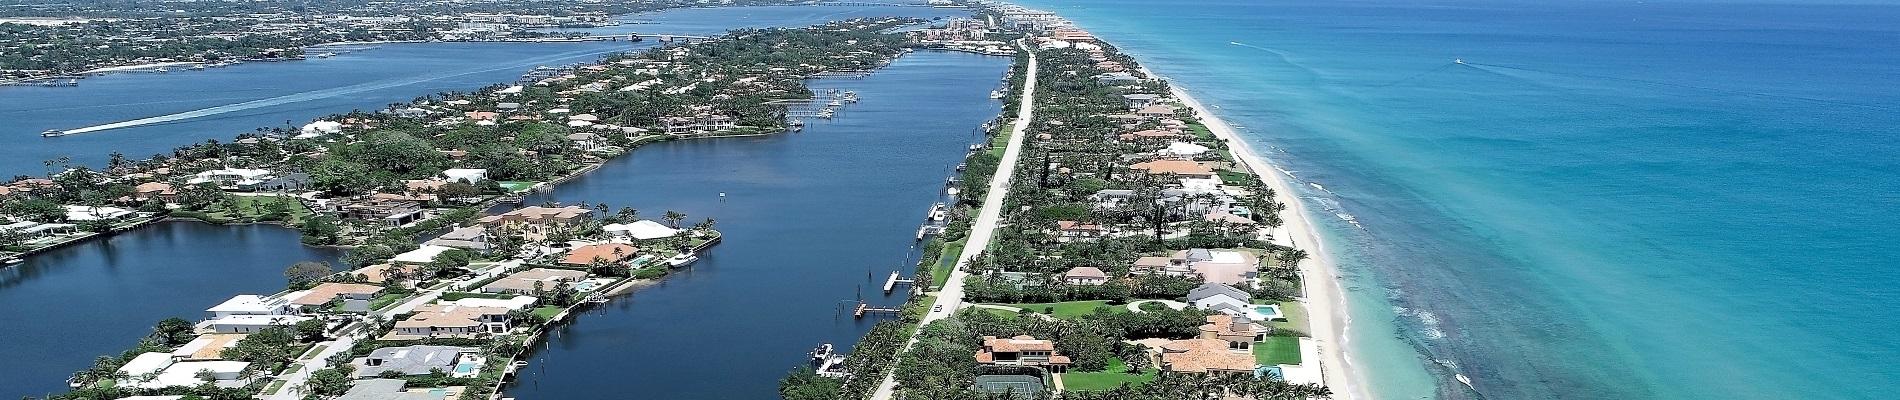 Boca Raton Oceanfront Estates - Luxury Resor